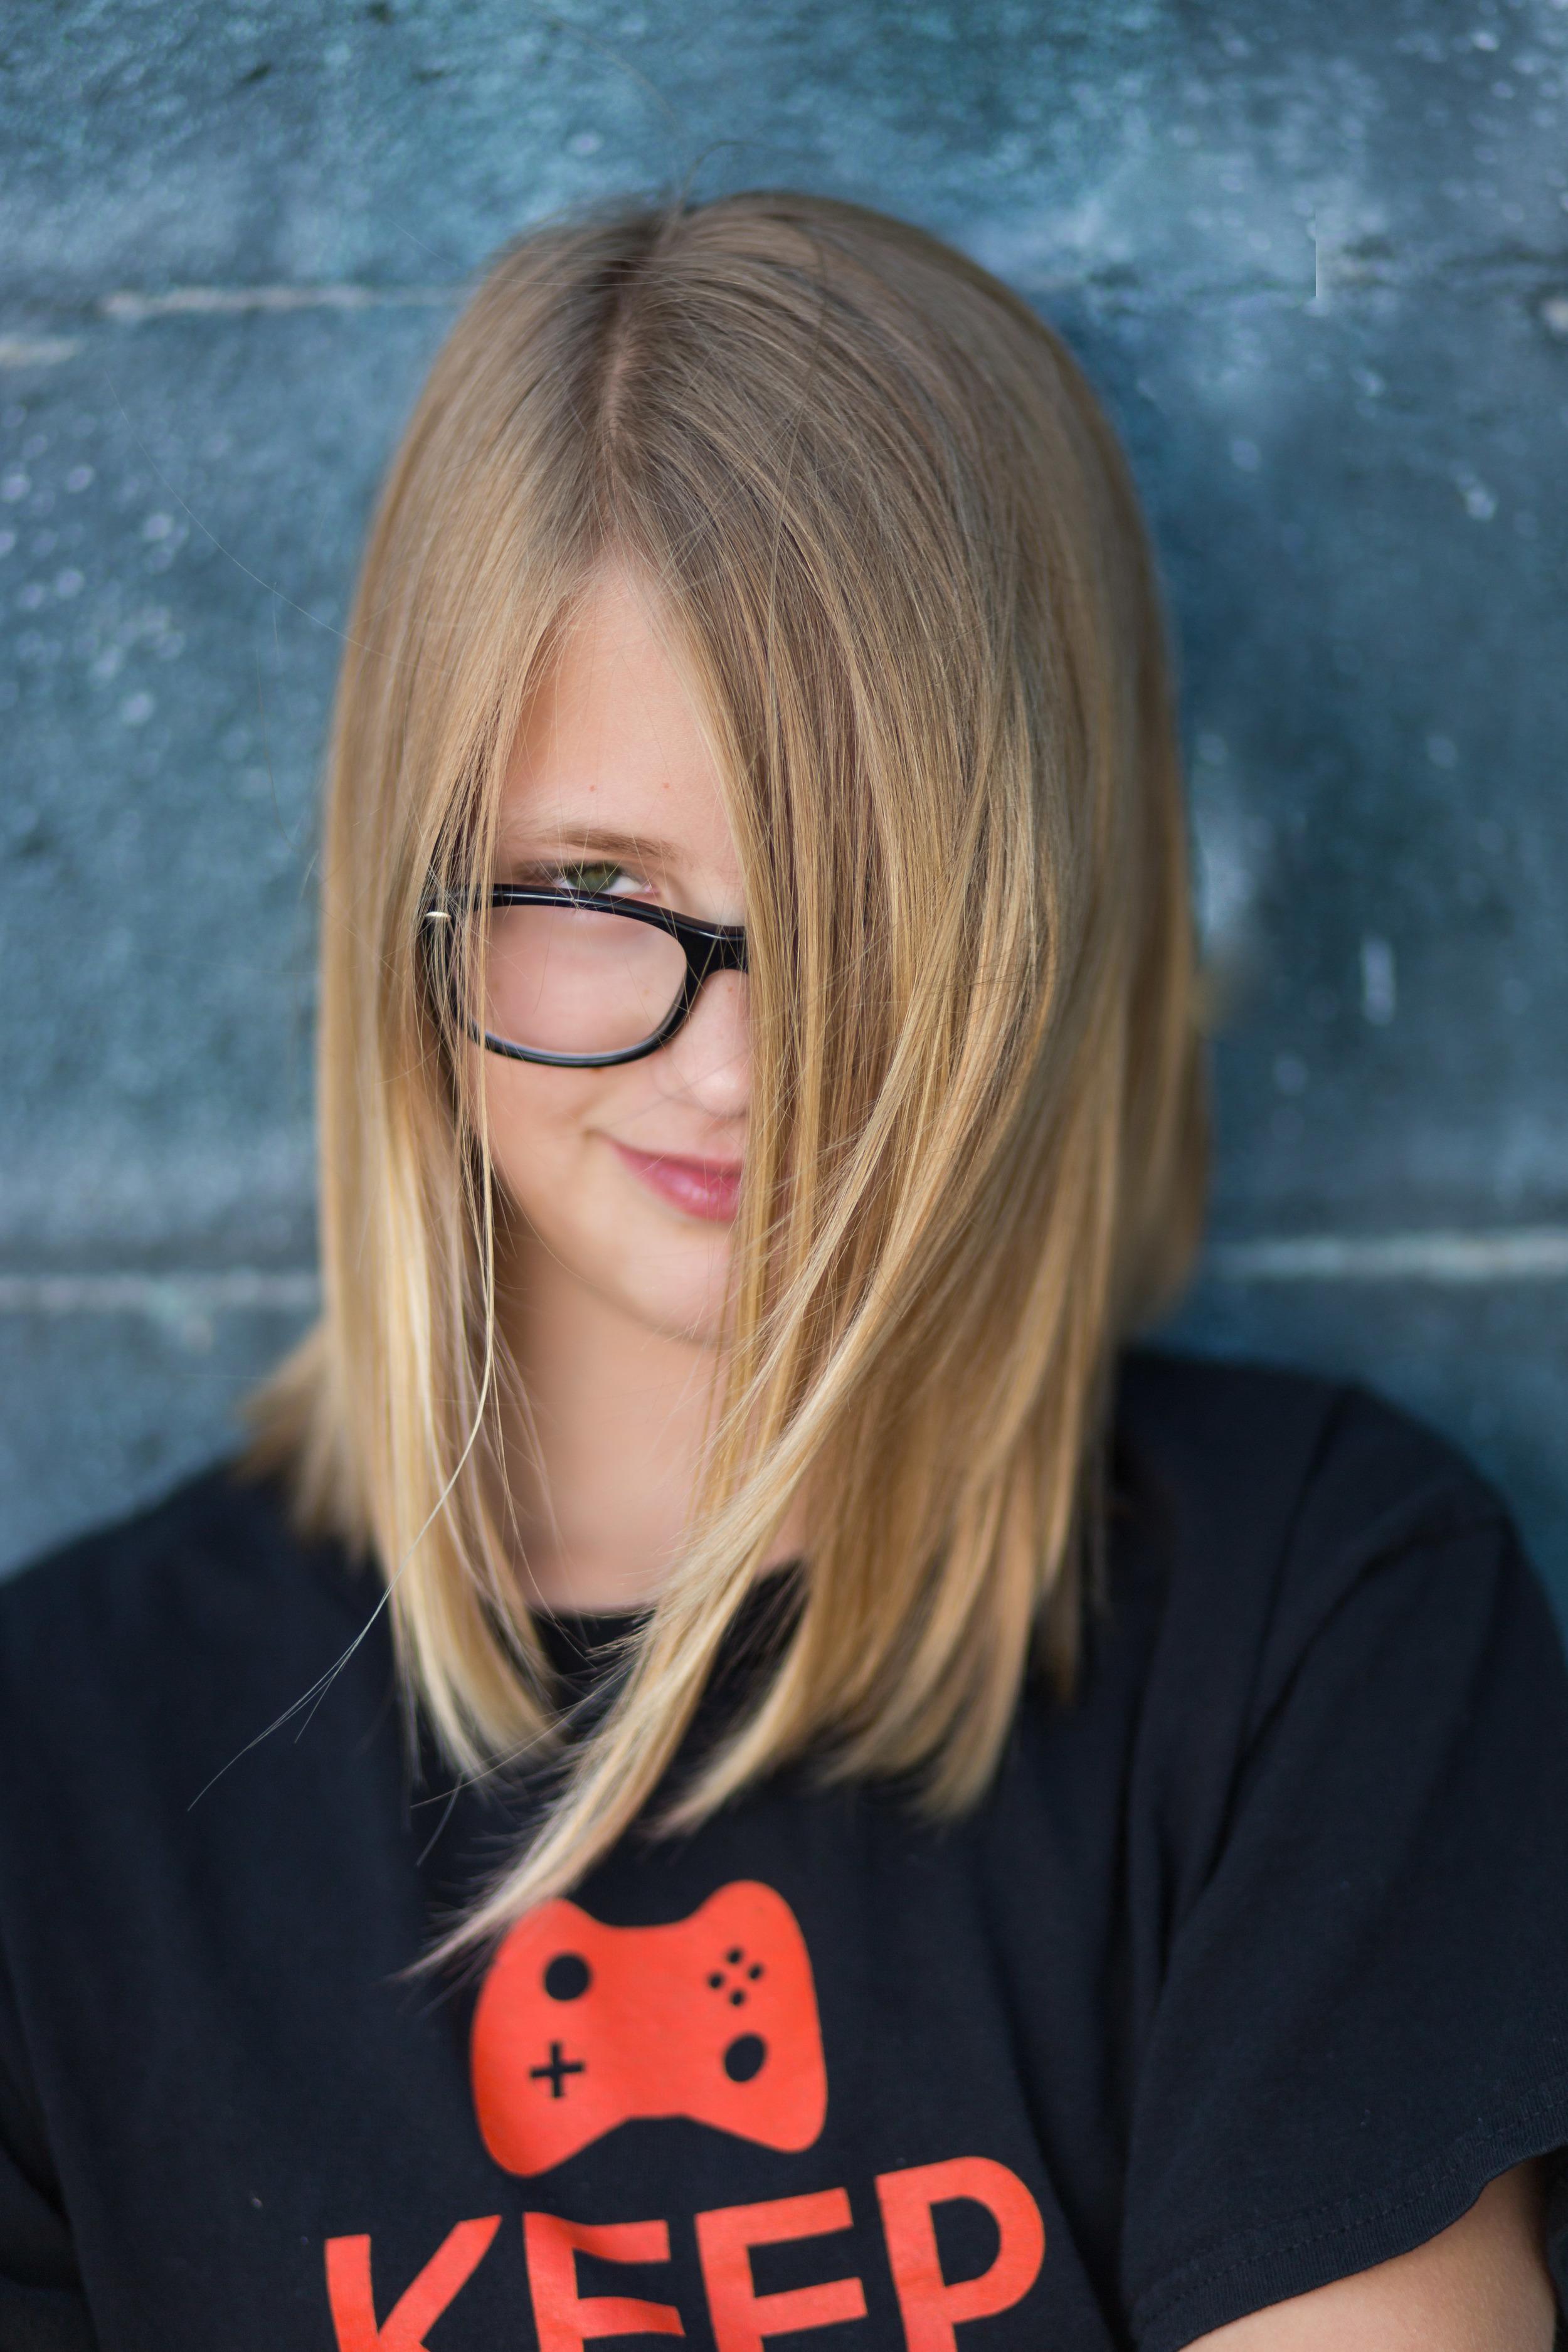 tween portrait of a girl wearing glasses